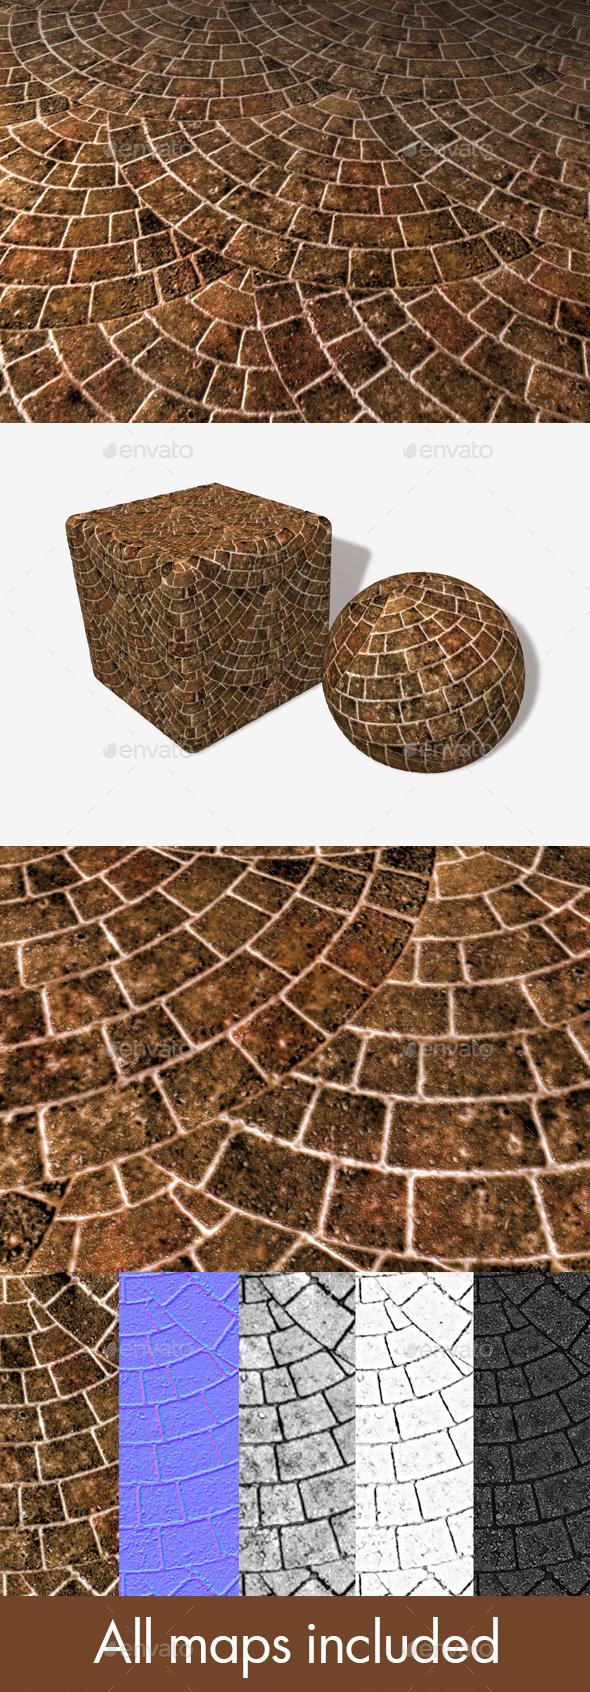 3DOcean Brick Paving Circle Seamless Texture 16877811